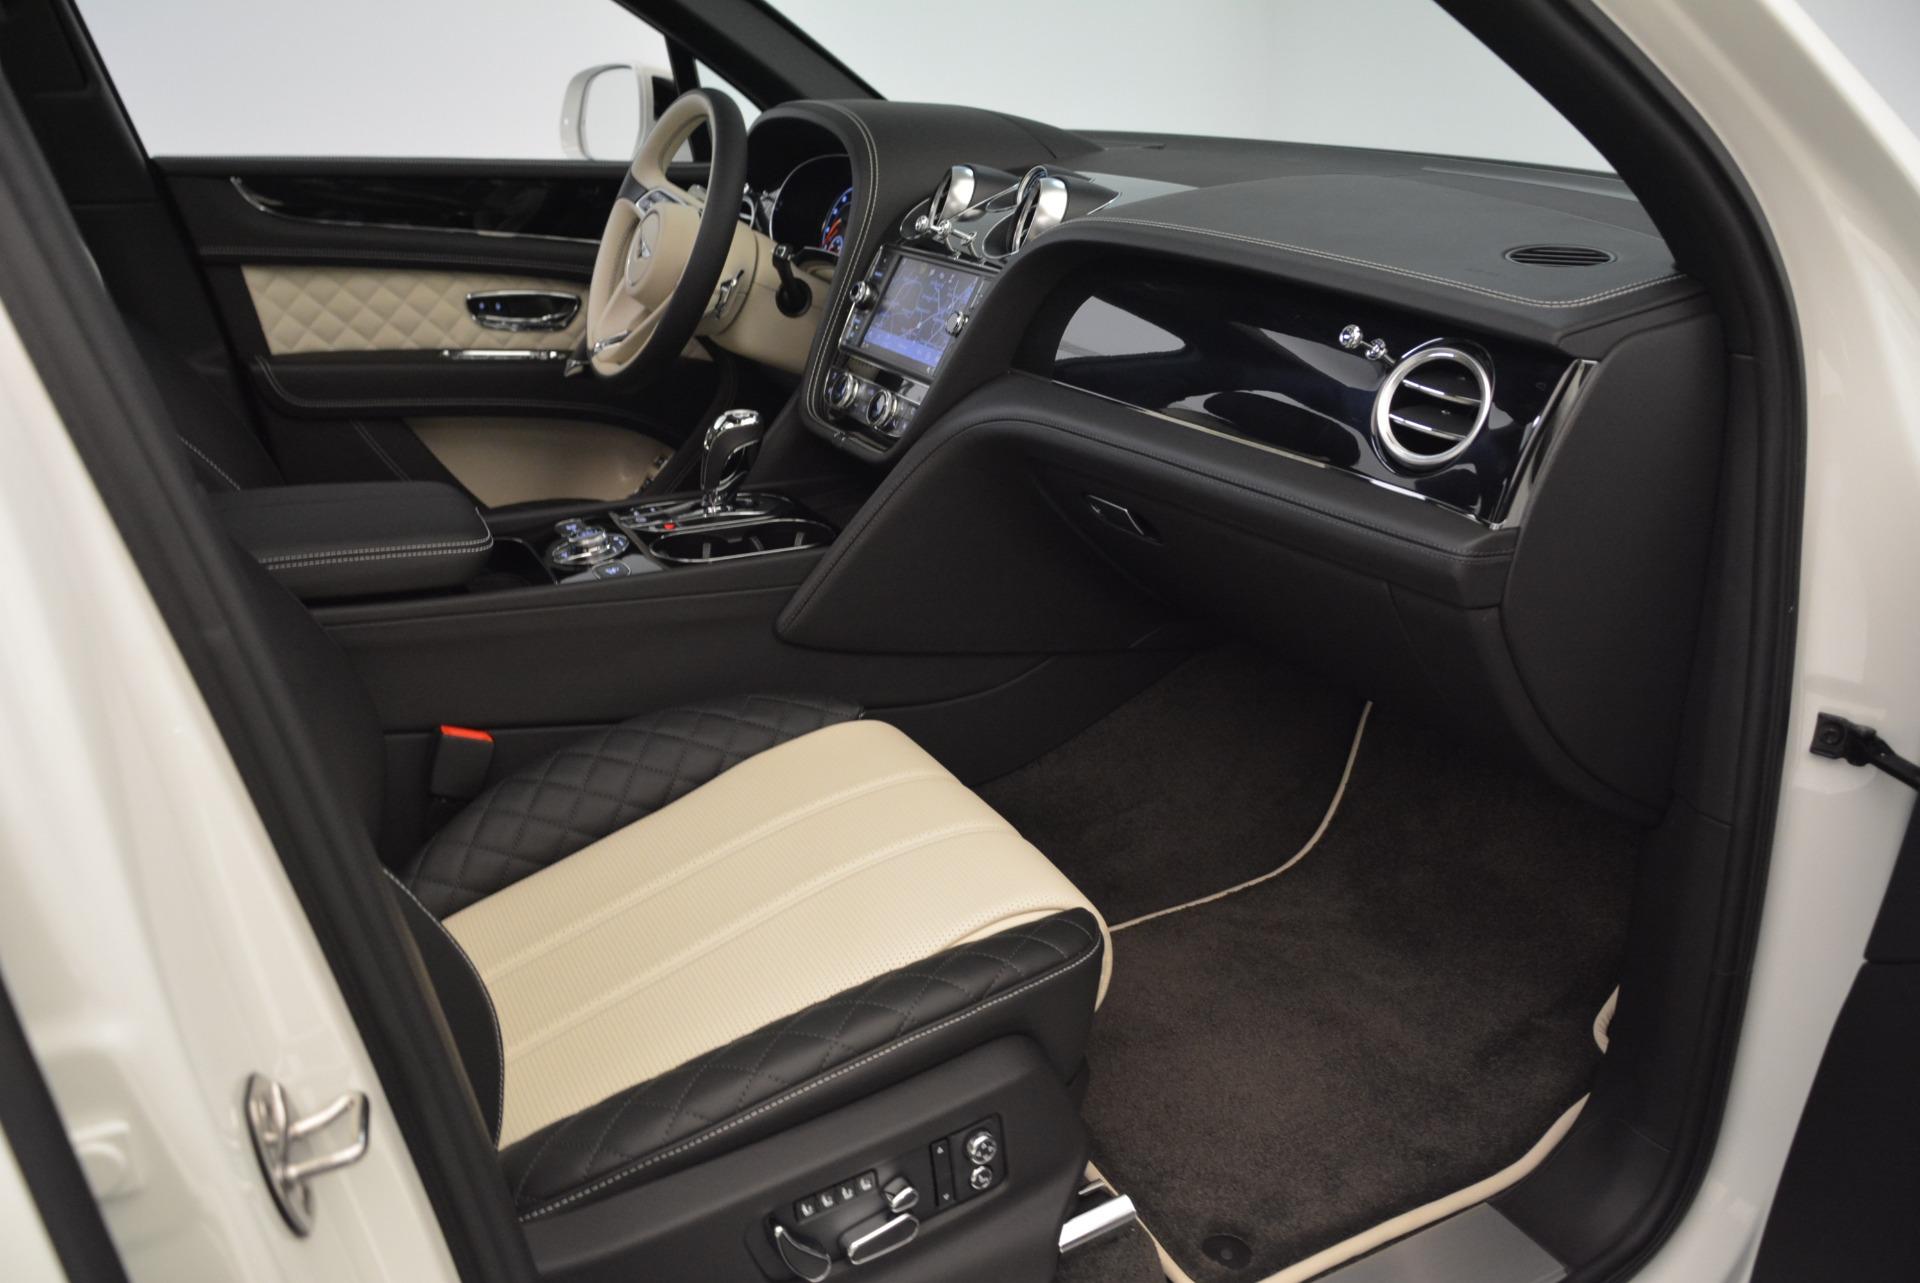 Used 2018 Bentley Bentayga Activity Edition For Sale In Westport, CT 1922_p26